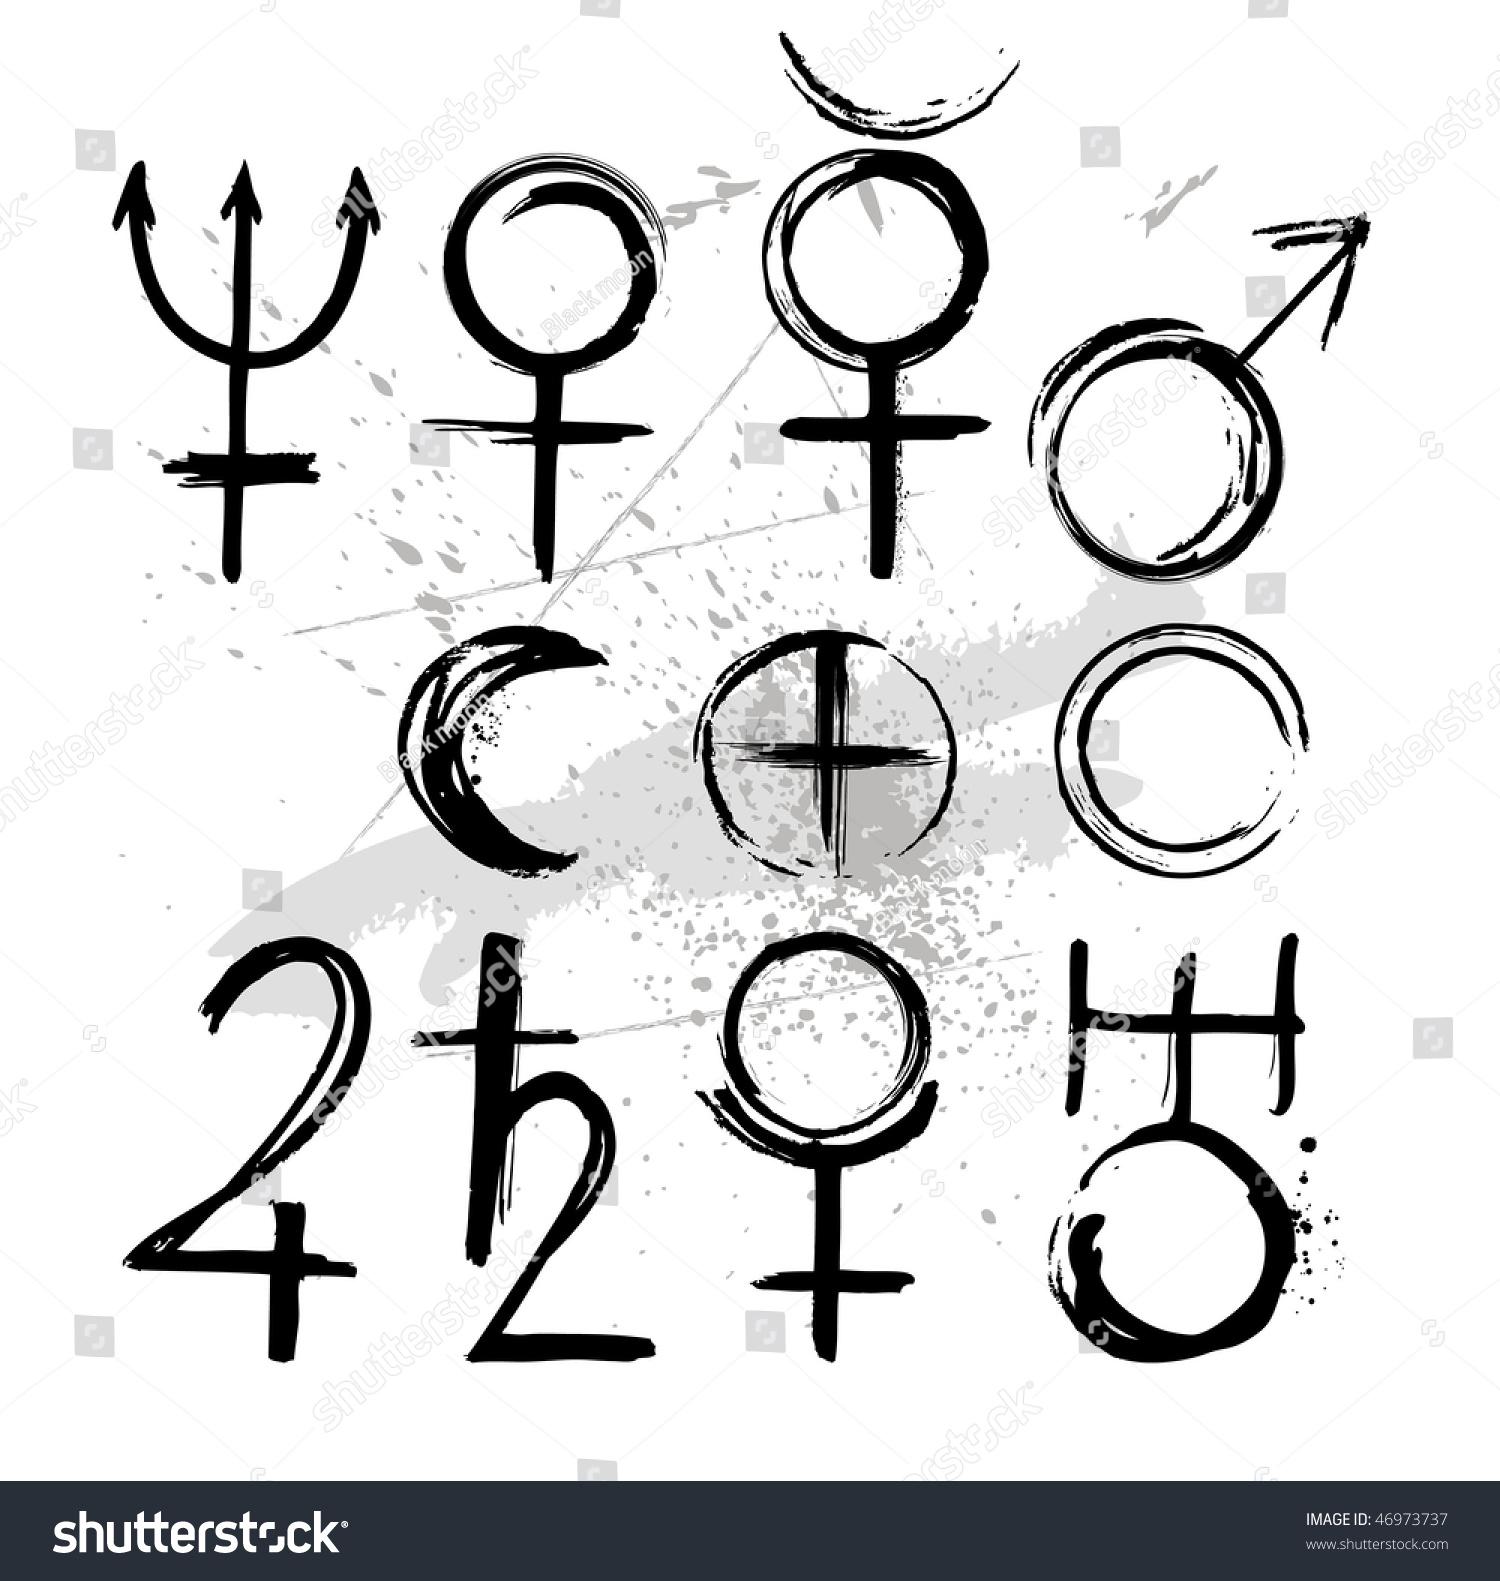 solar system symbols - photo #26